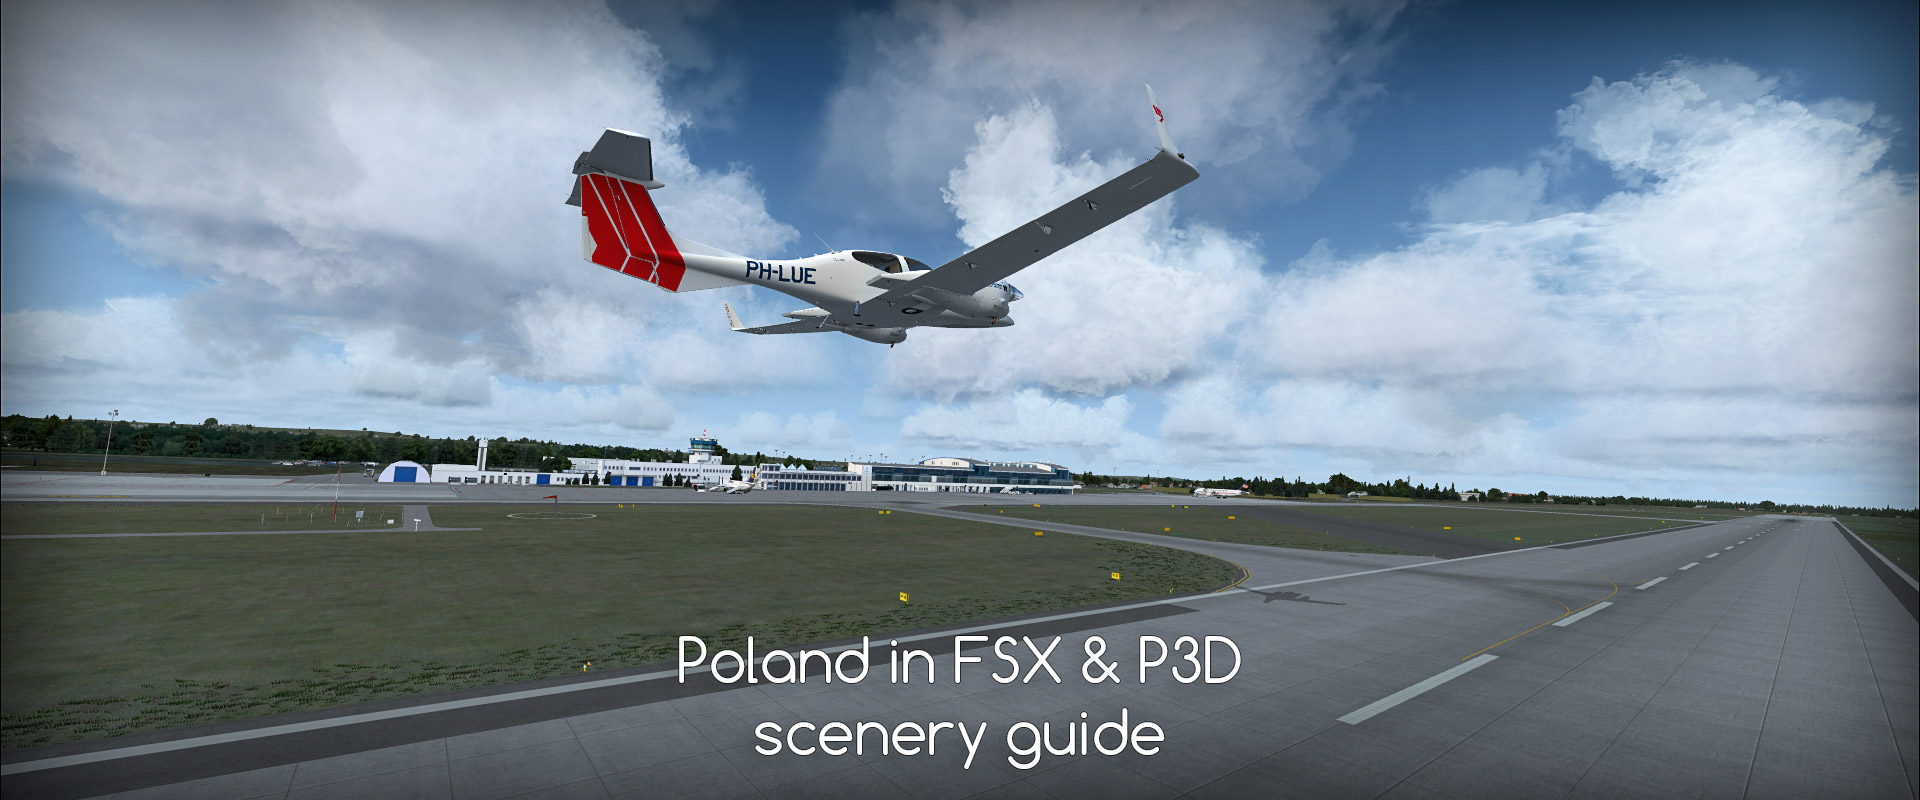 Poland in FSX & P3D - scenery guide